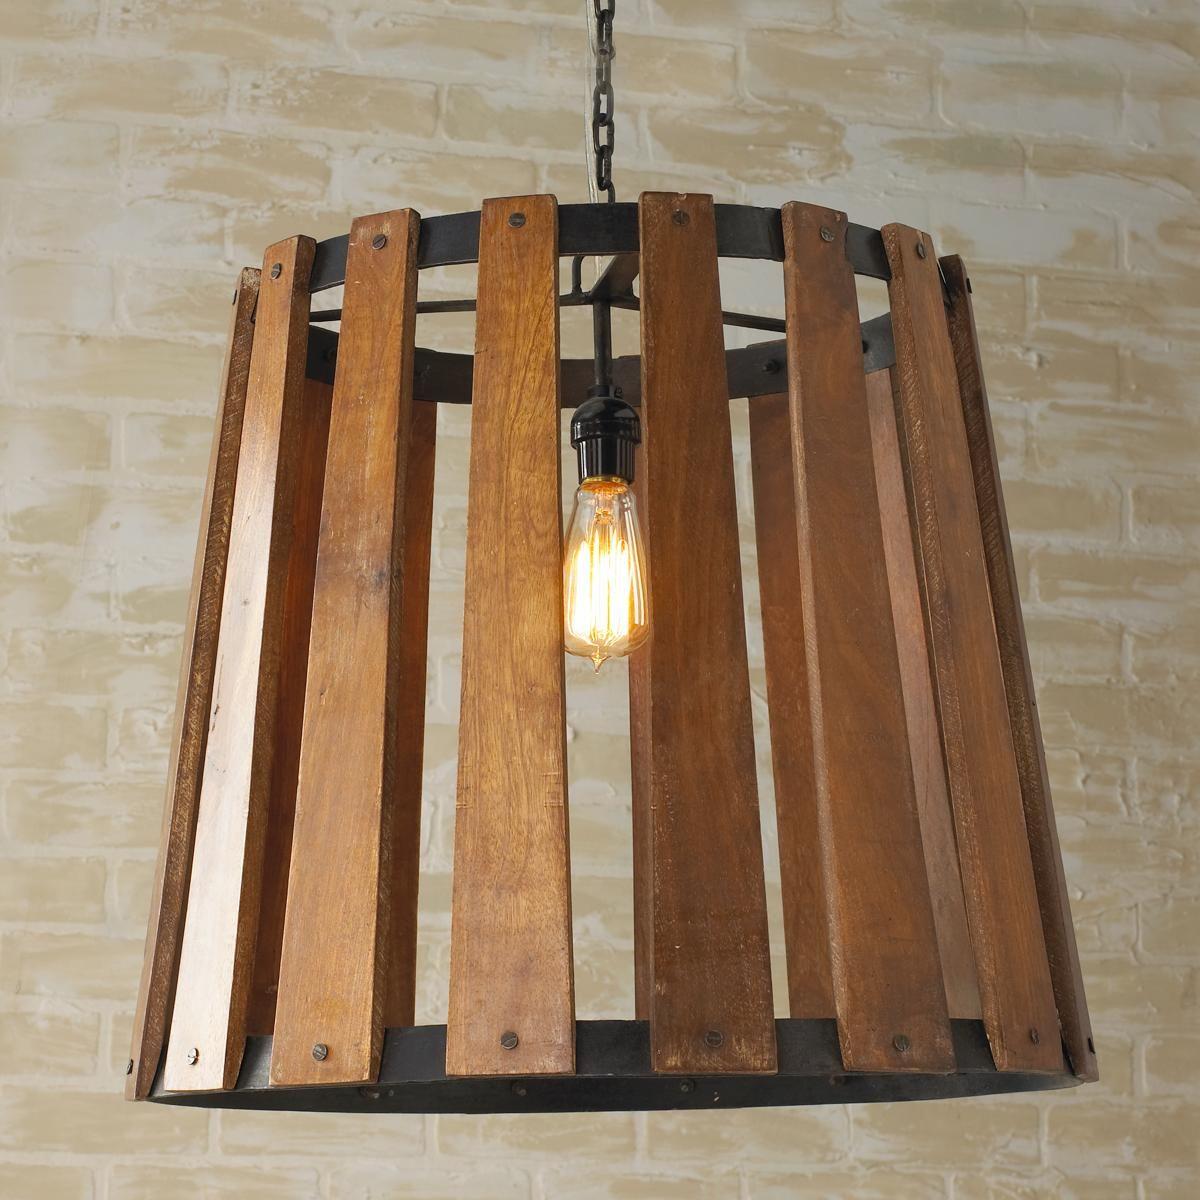 Rustic Wood Light Rustic Ceiling Light Wood Light Fixture: Rustic Open Barrel Wood Pendant Light The Dark Rich Finish